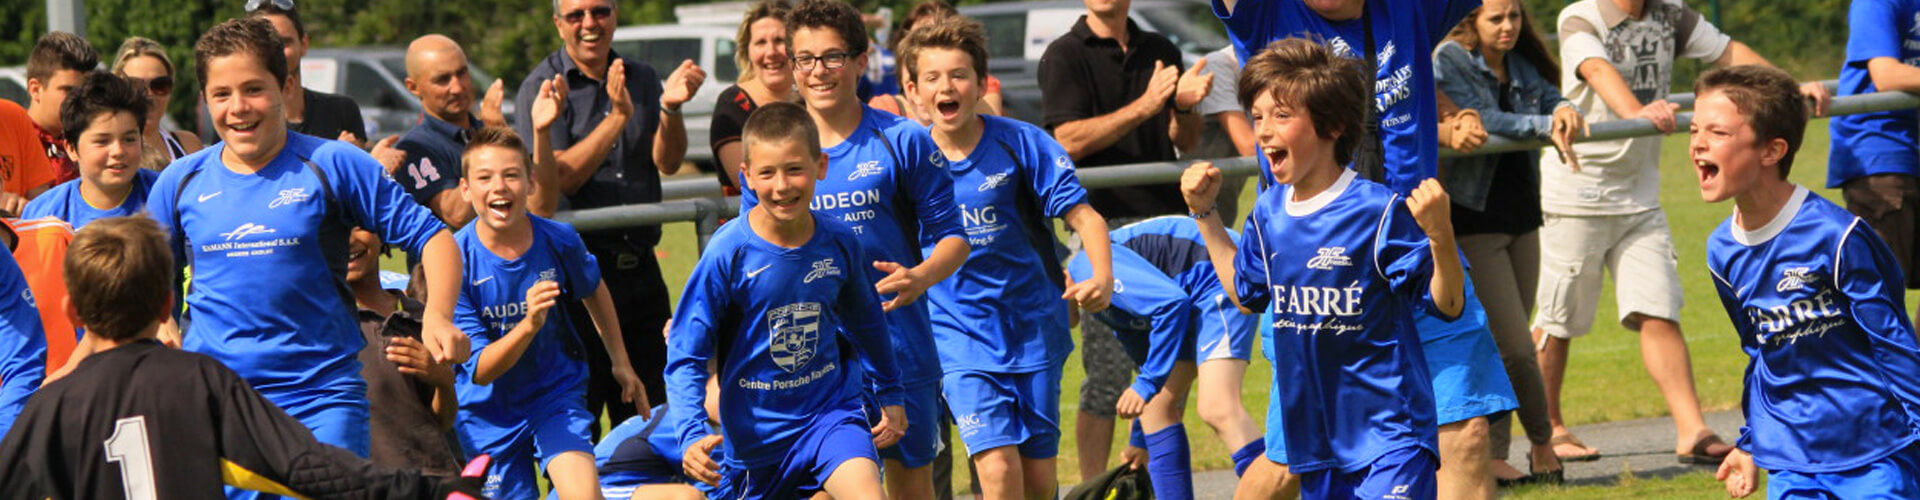 football-jeune-france-cholet-2